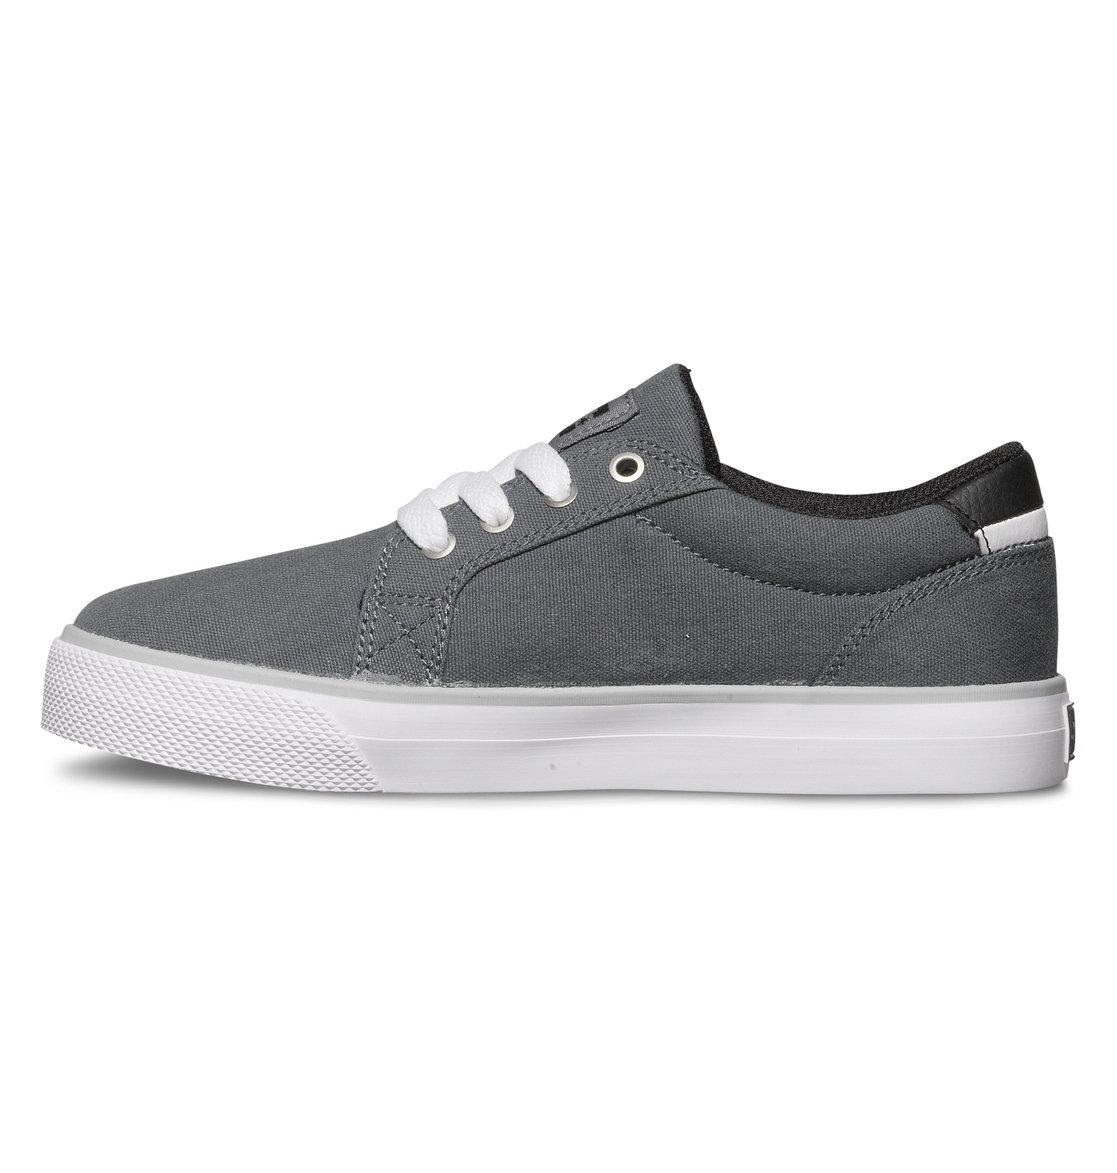 DC Shoes Council TX - Zapatillas bajas - niño - EU 38 fvHeDb